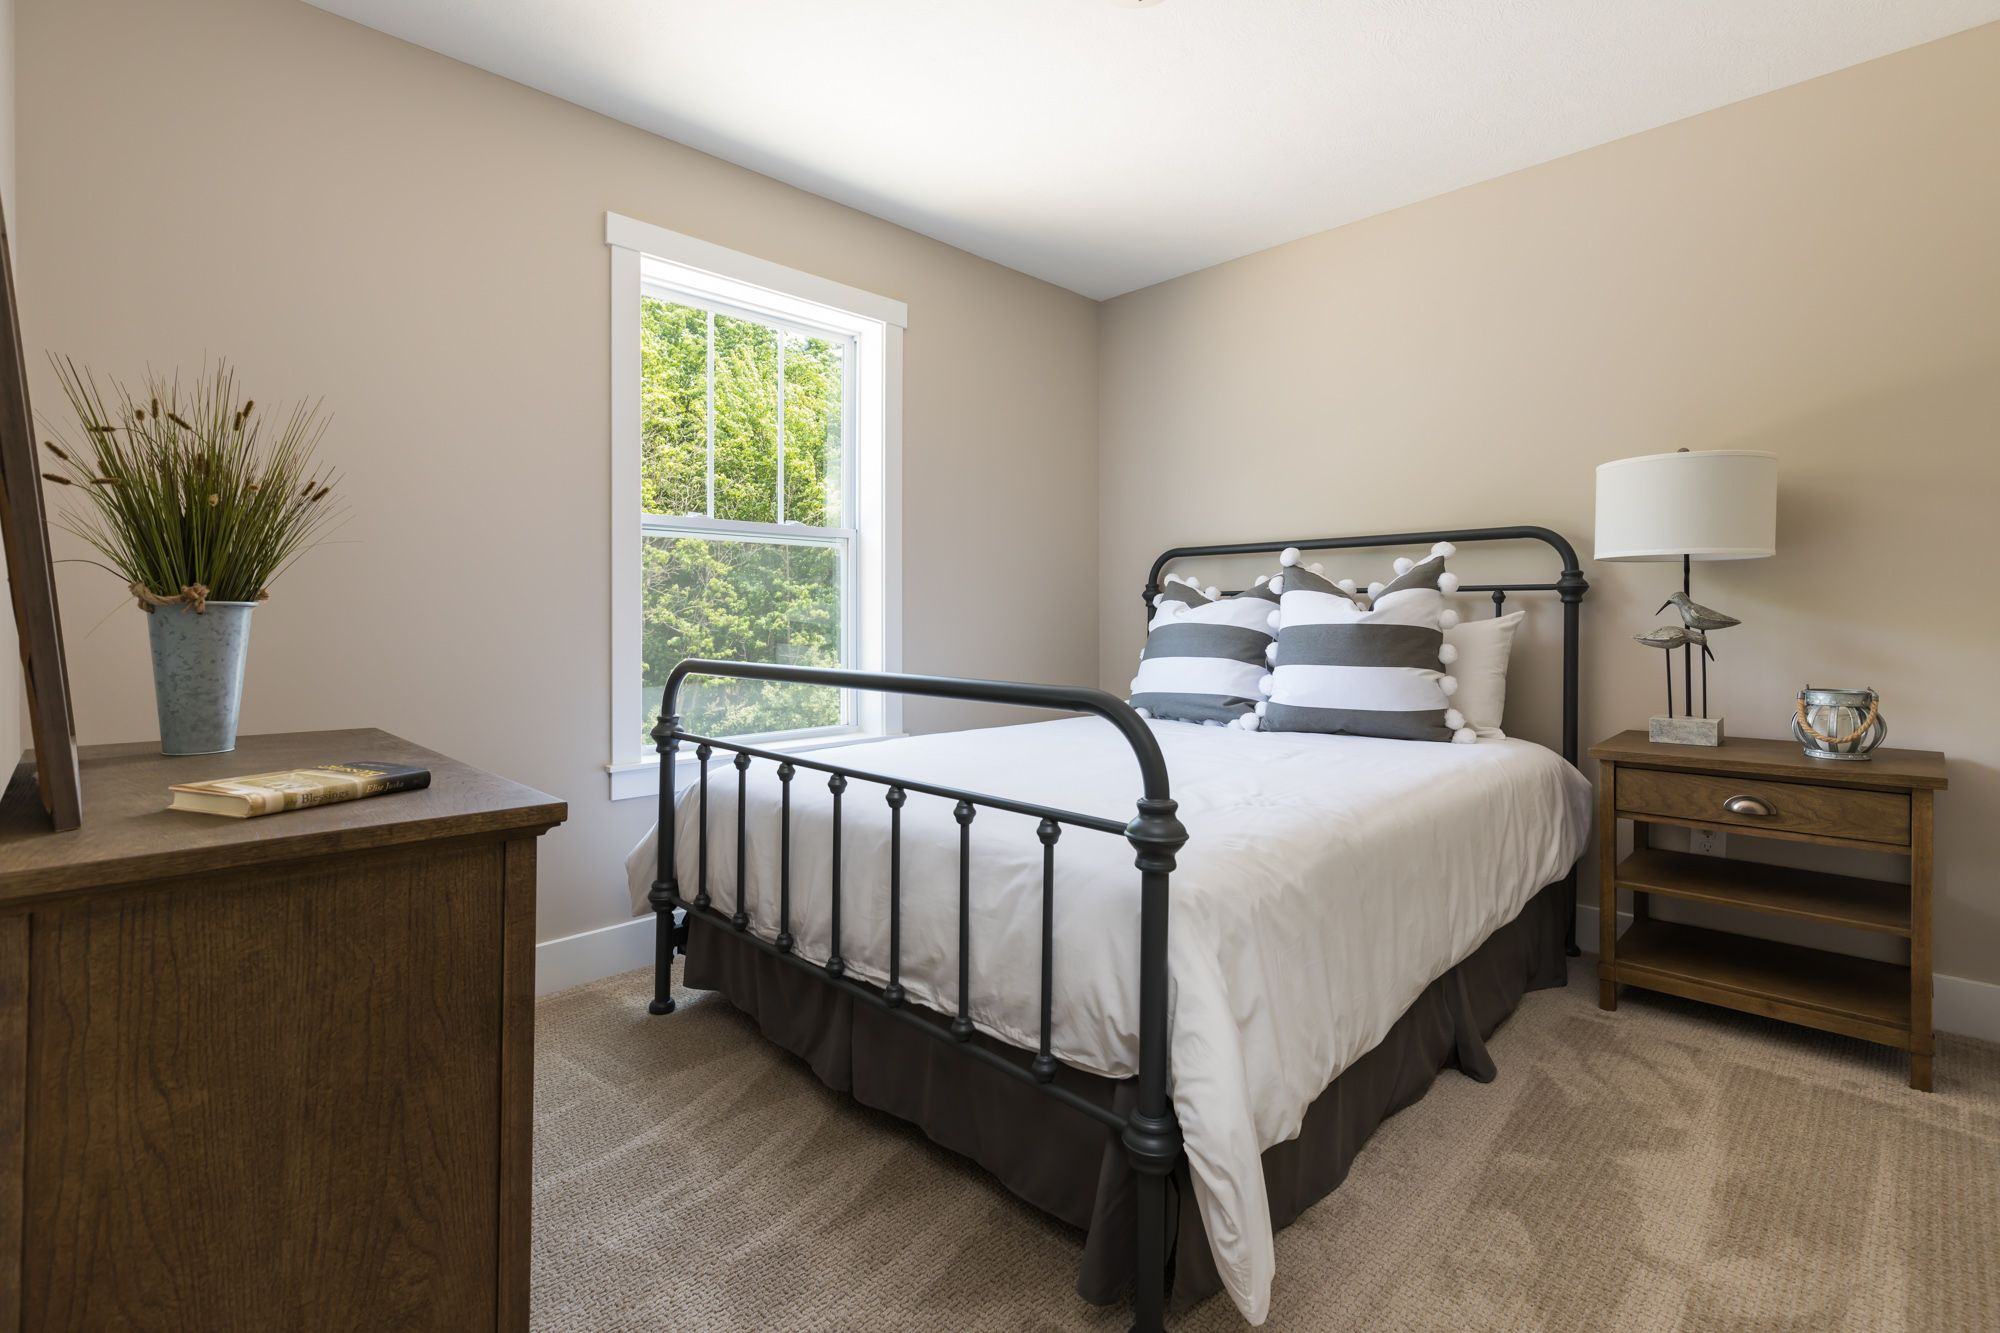 Bedroom featured in the Elements 2100 By Allen Edwin Homes in Grand Rapids, MI